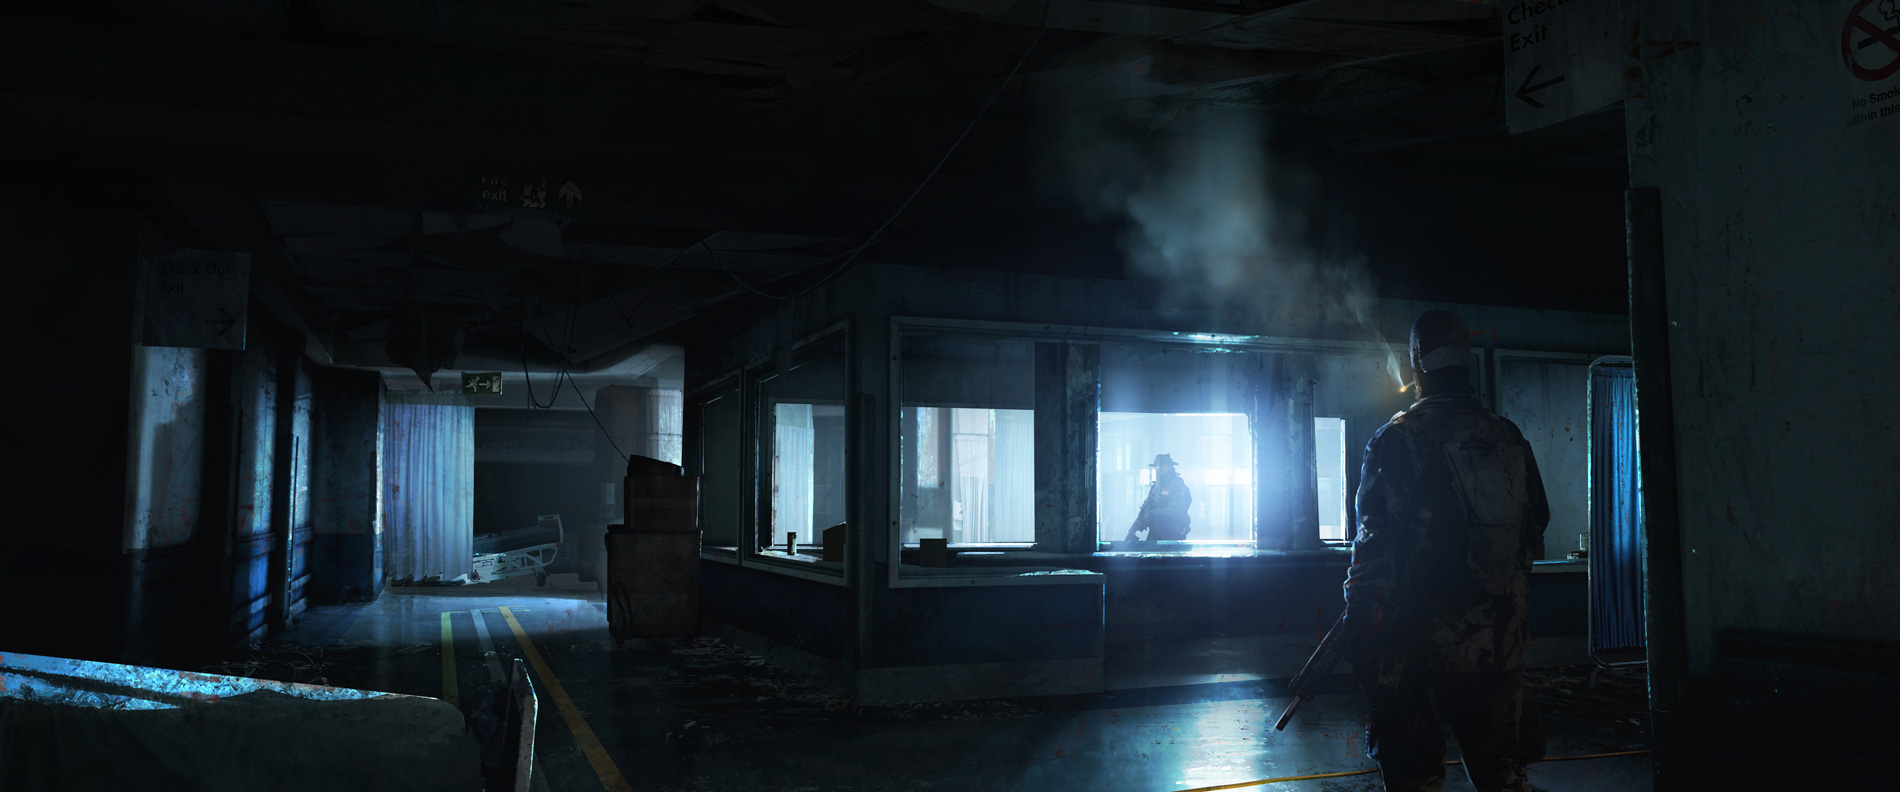 The Last Of Us Concept Art Floodlights Js 01